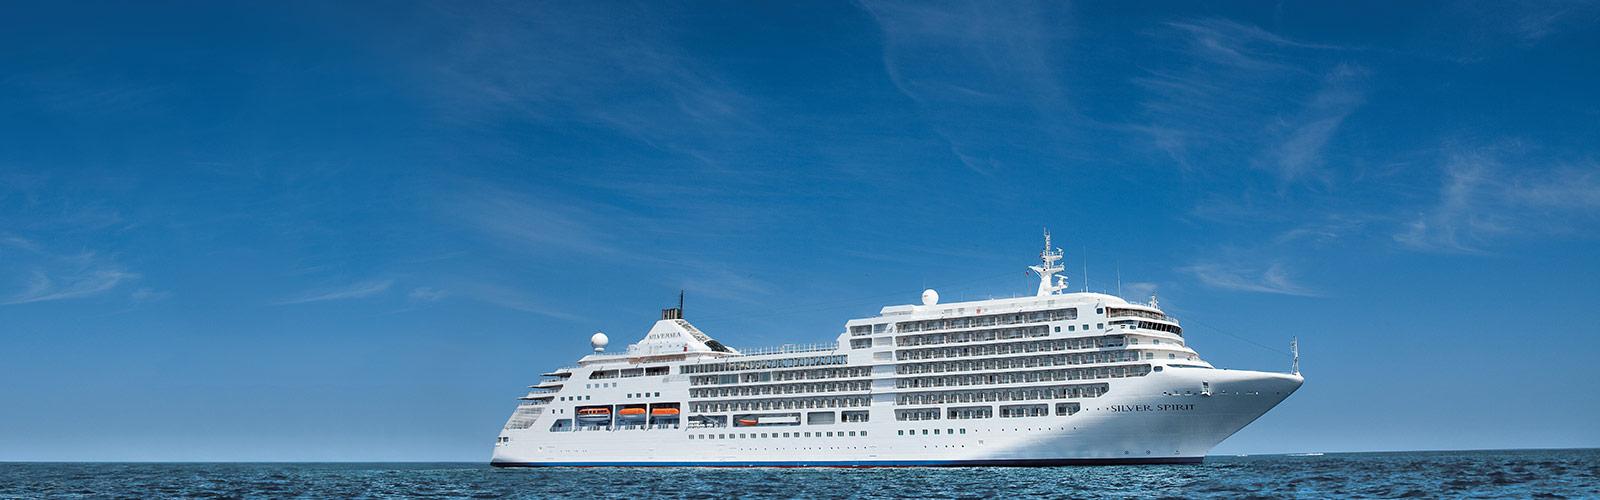 PIER1 Cruise Experts passando por Copenhagen, Estocolmo e Londres